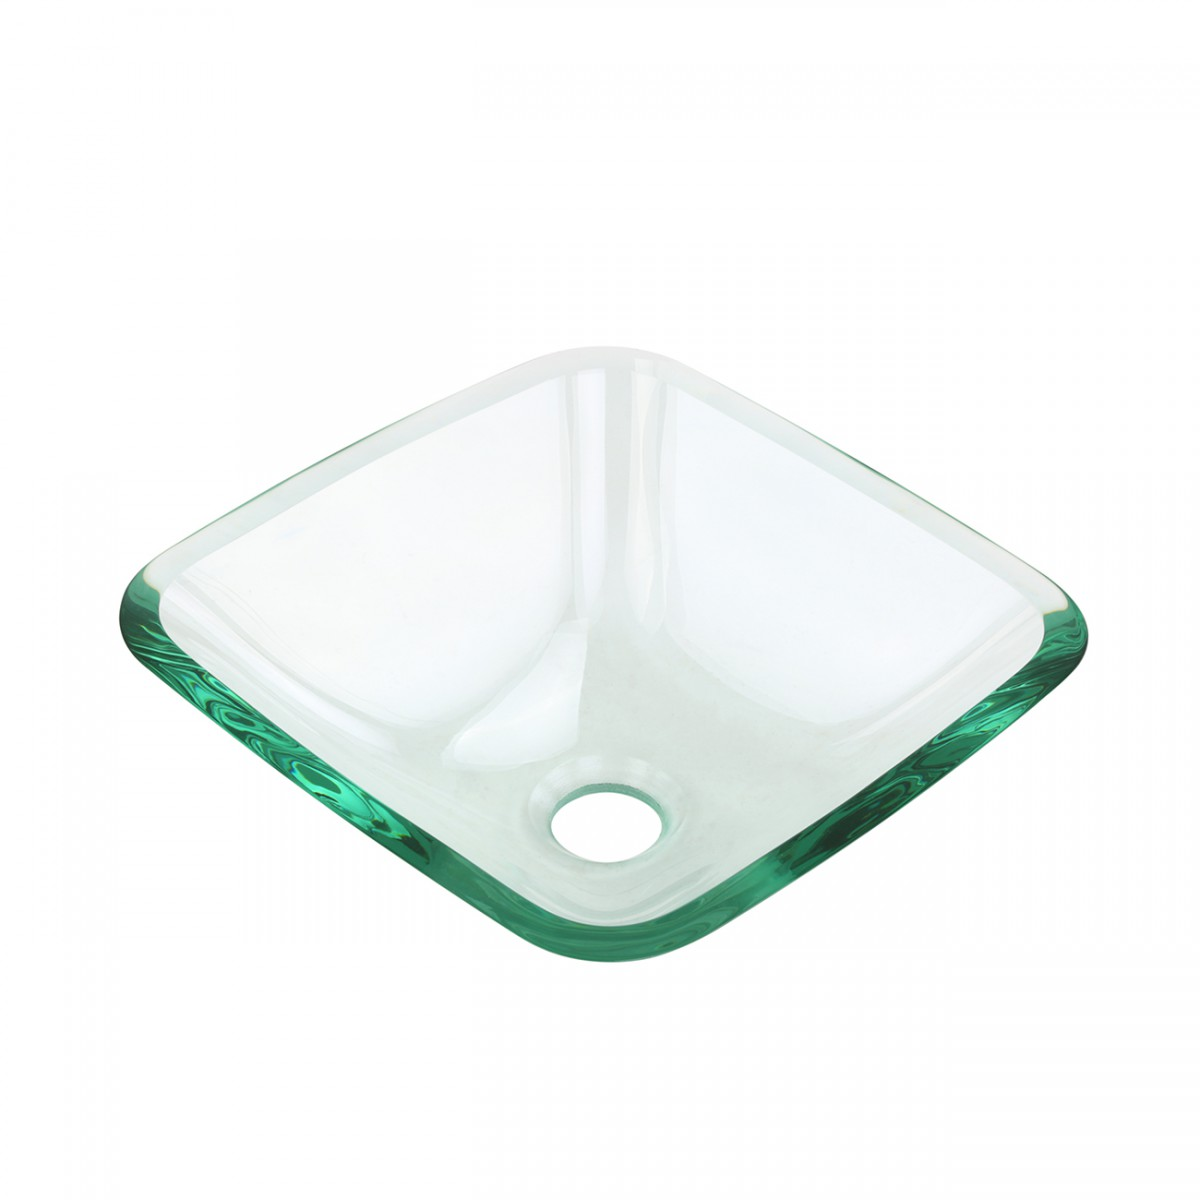 Tempered Glass Vessel Sink with Drain, Clear Square Mini Bowl Sink Set of 2 bathroom vessel sinks Countertop vessel sink MR Direct 852 Alternative vintage luxury